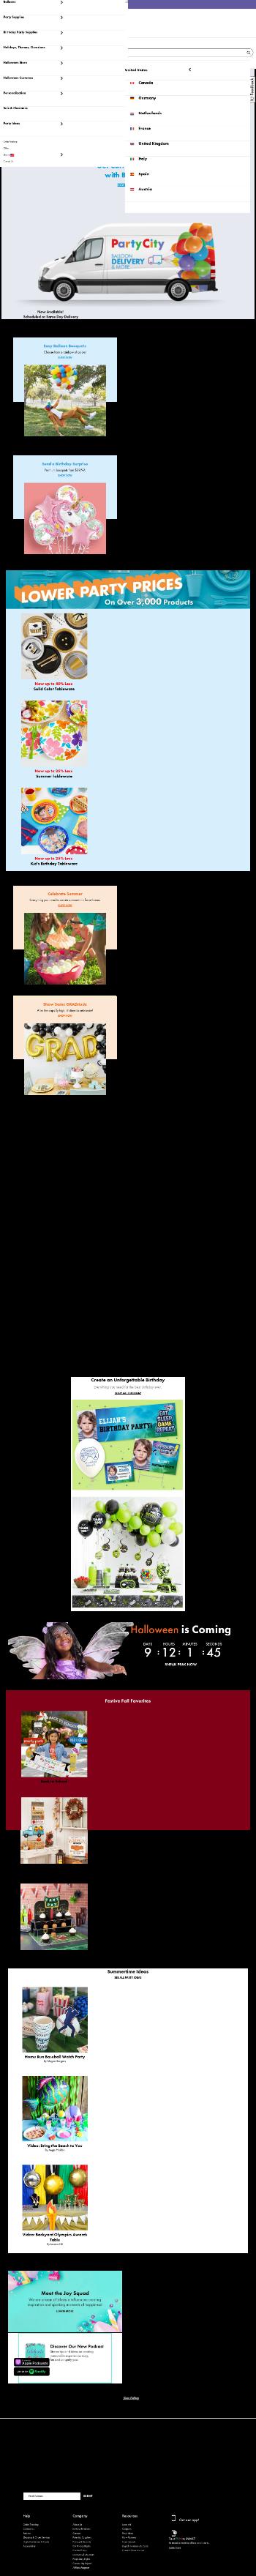 Party City Holdco Inc. Website Screenshot